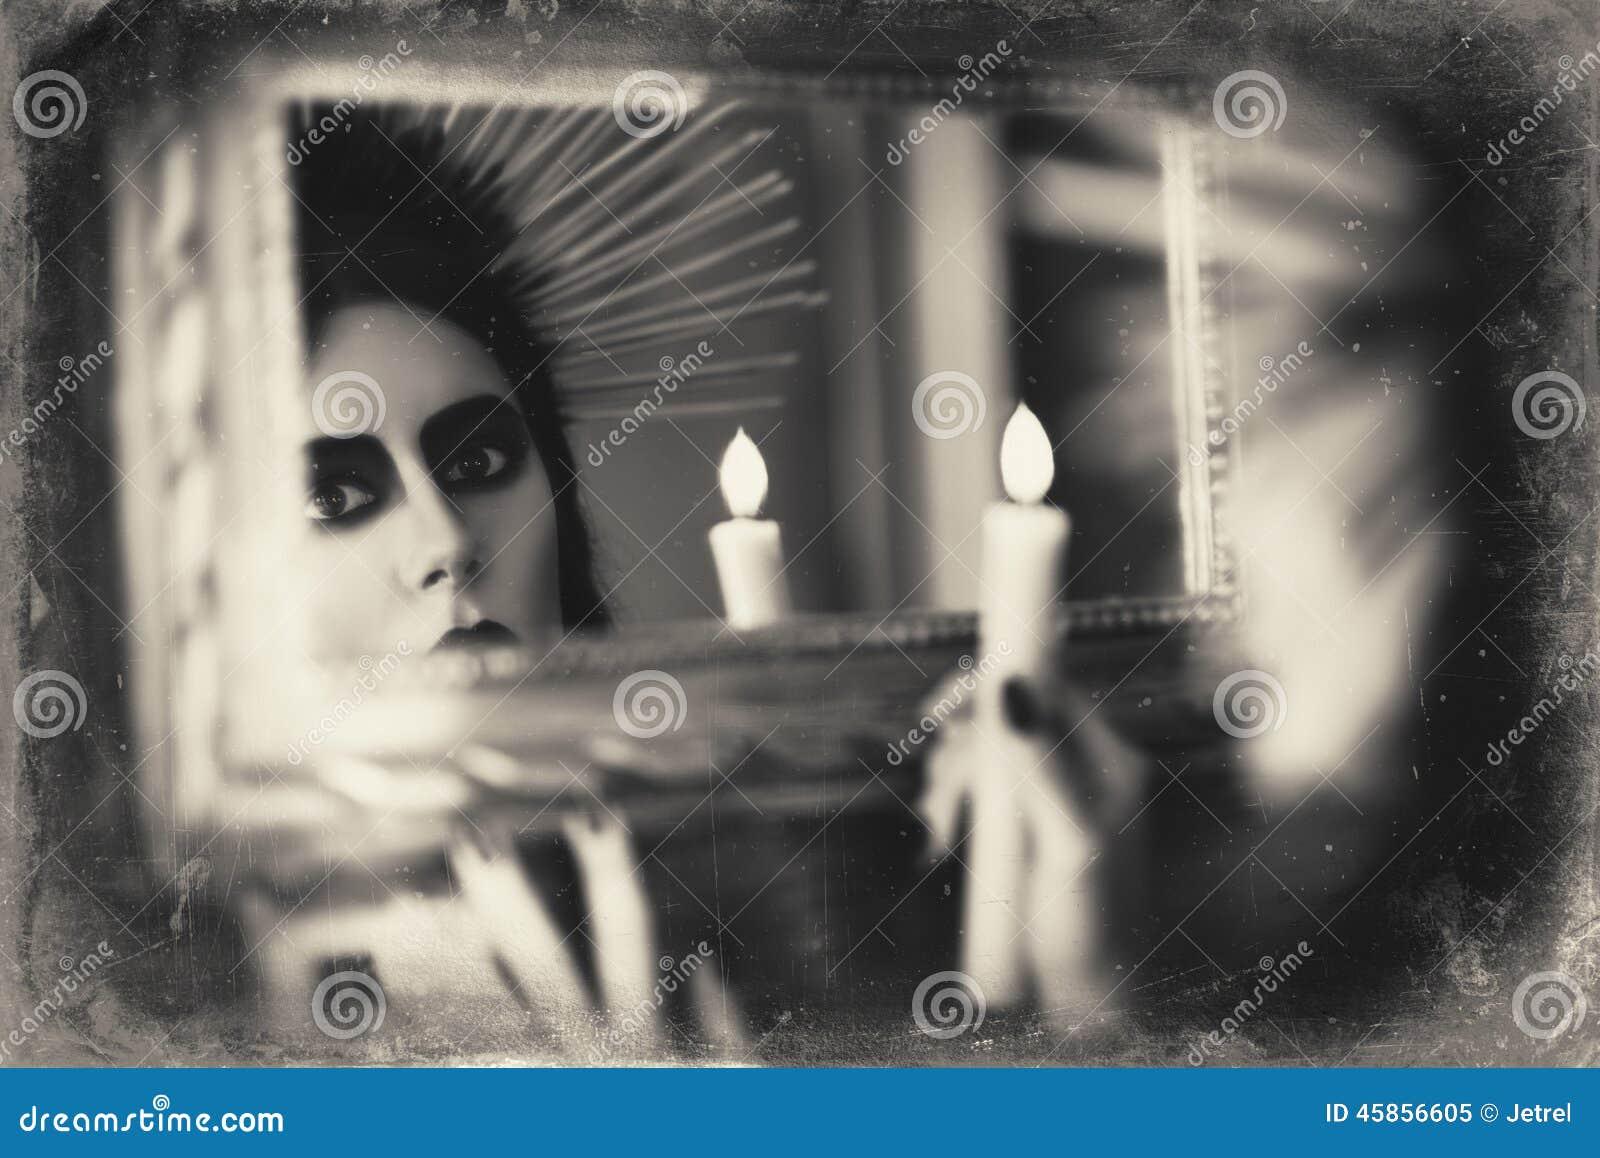 Free mirror girl pictures, teen lesbian wmv megauploader